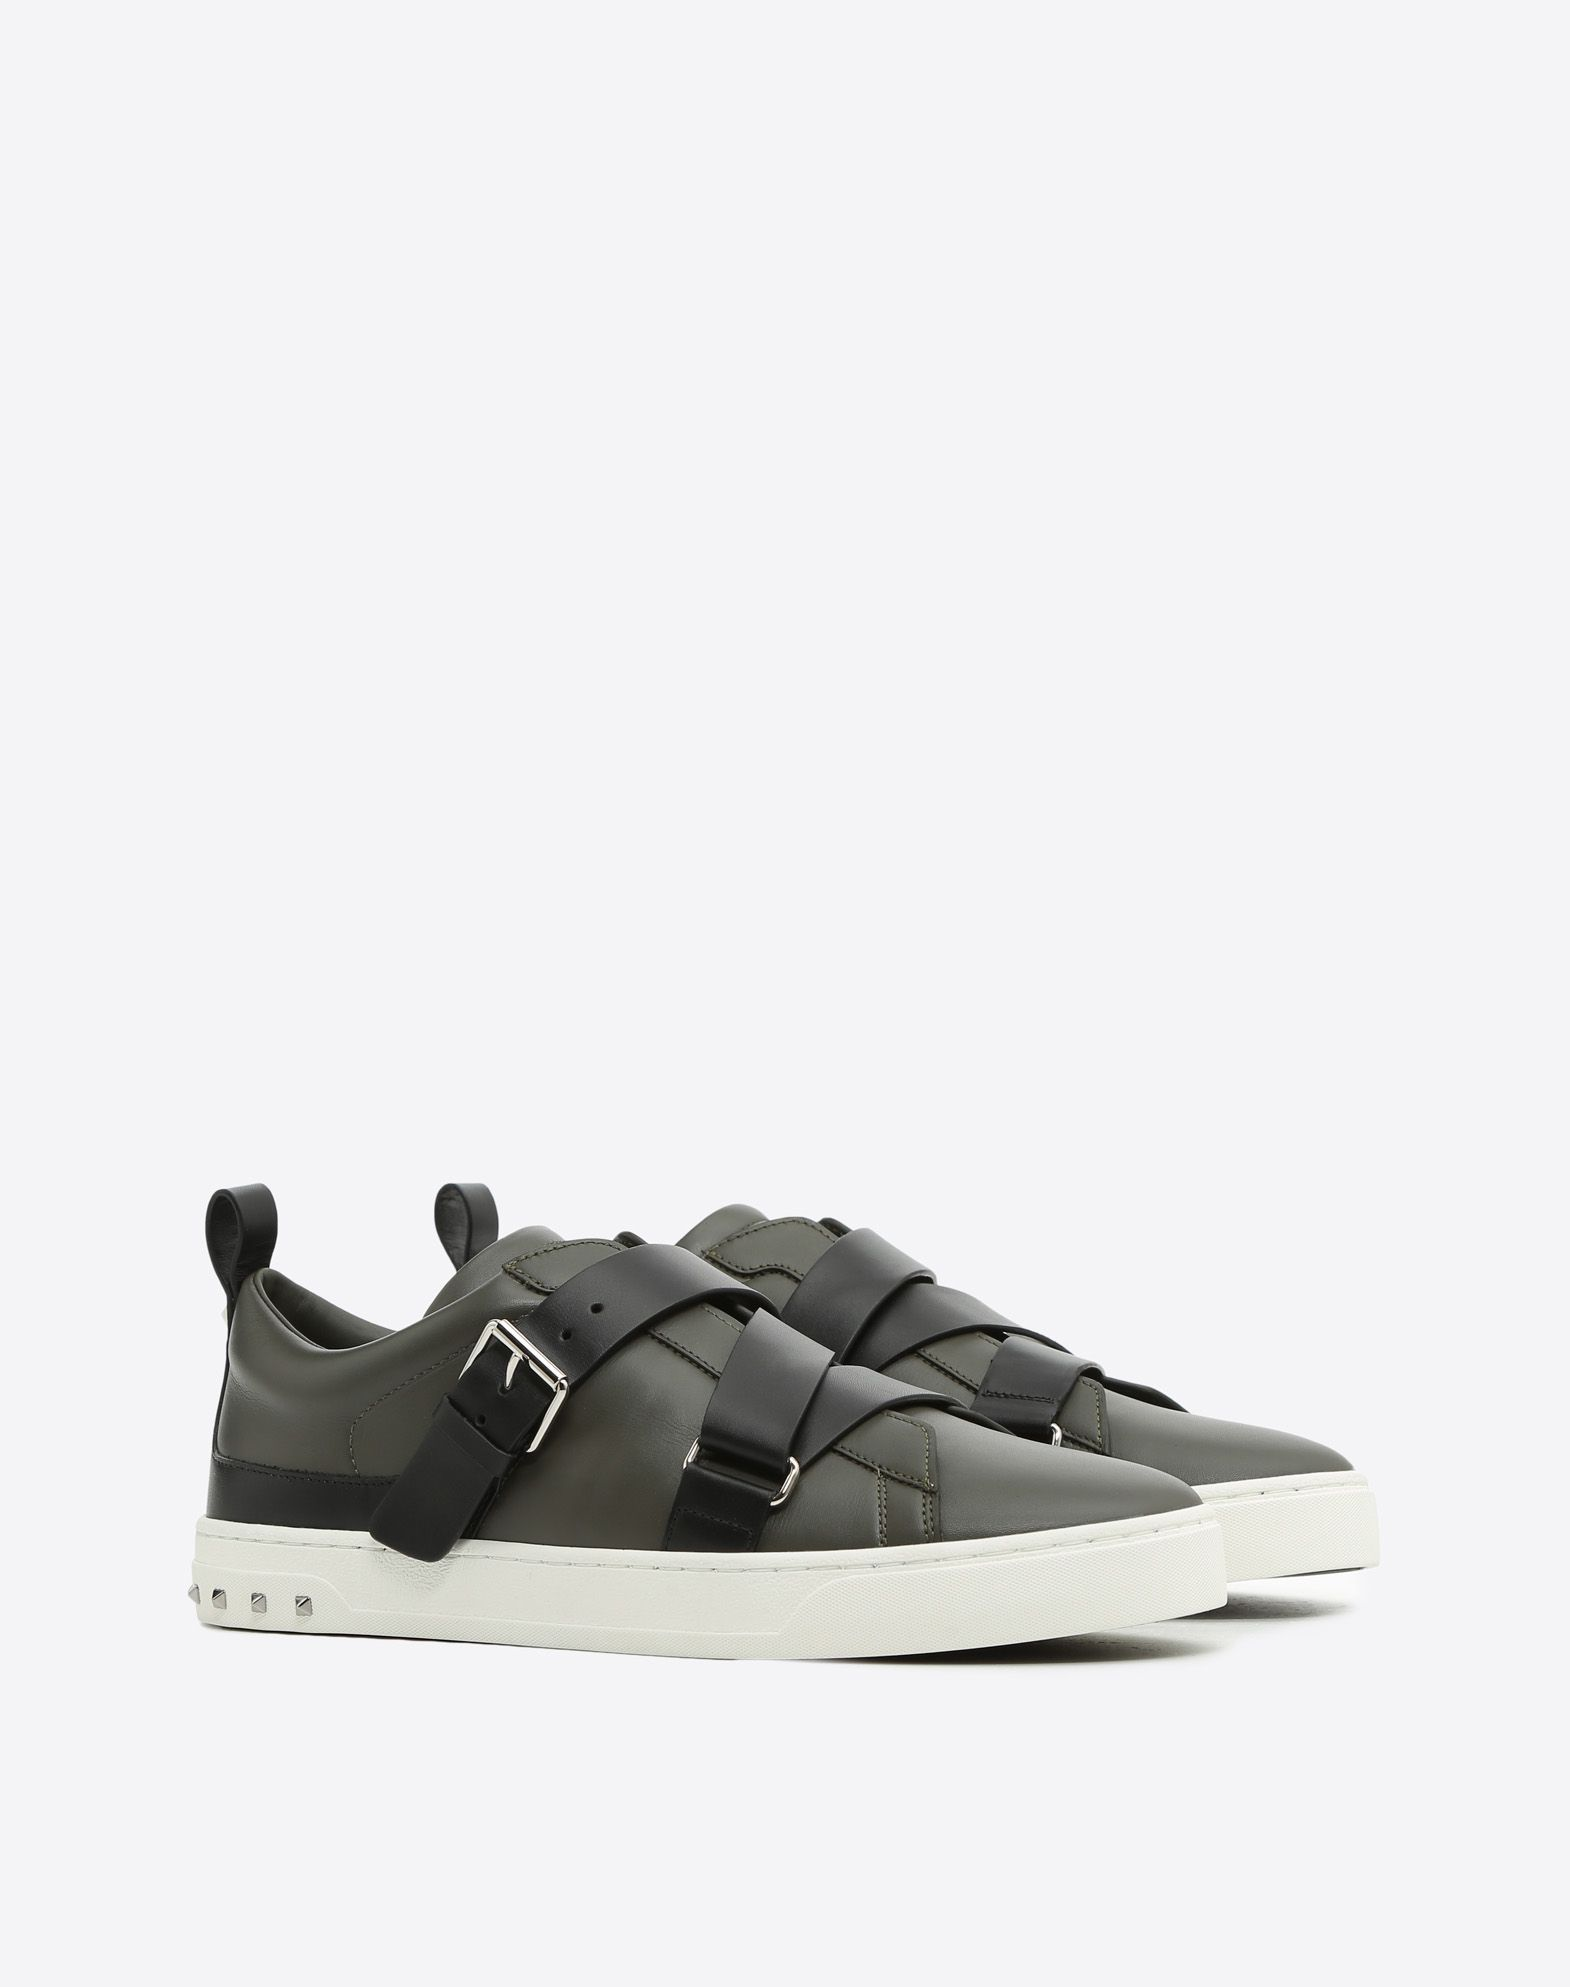 66e5795b15 VALENTINO GARAVANI UOMO V-Punk Sneaker LOW-TOP SNEAKERS U r ...